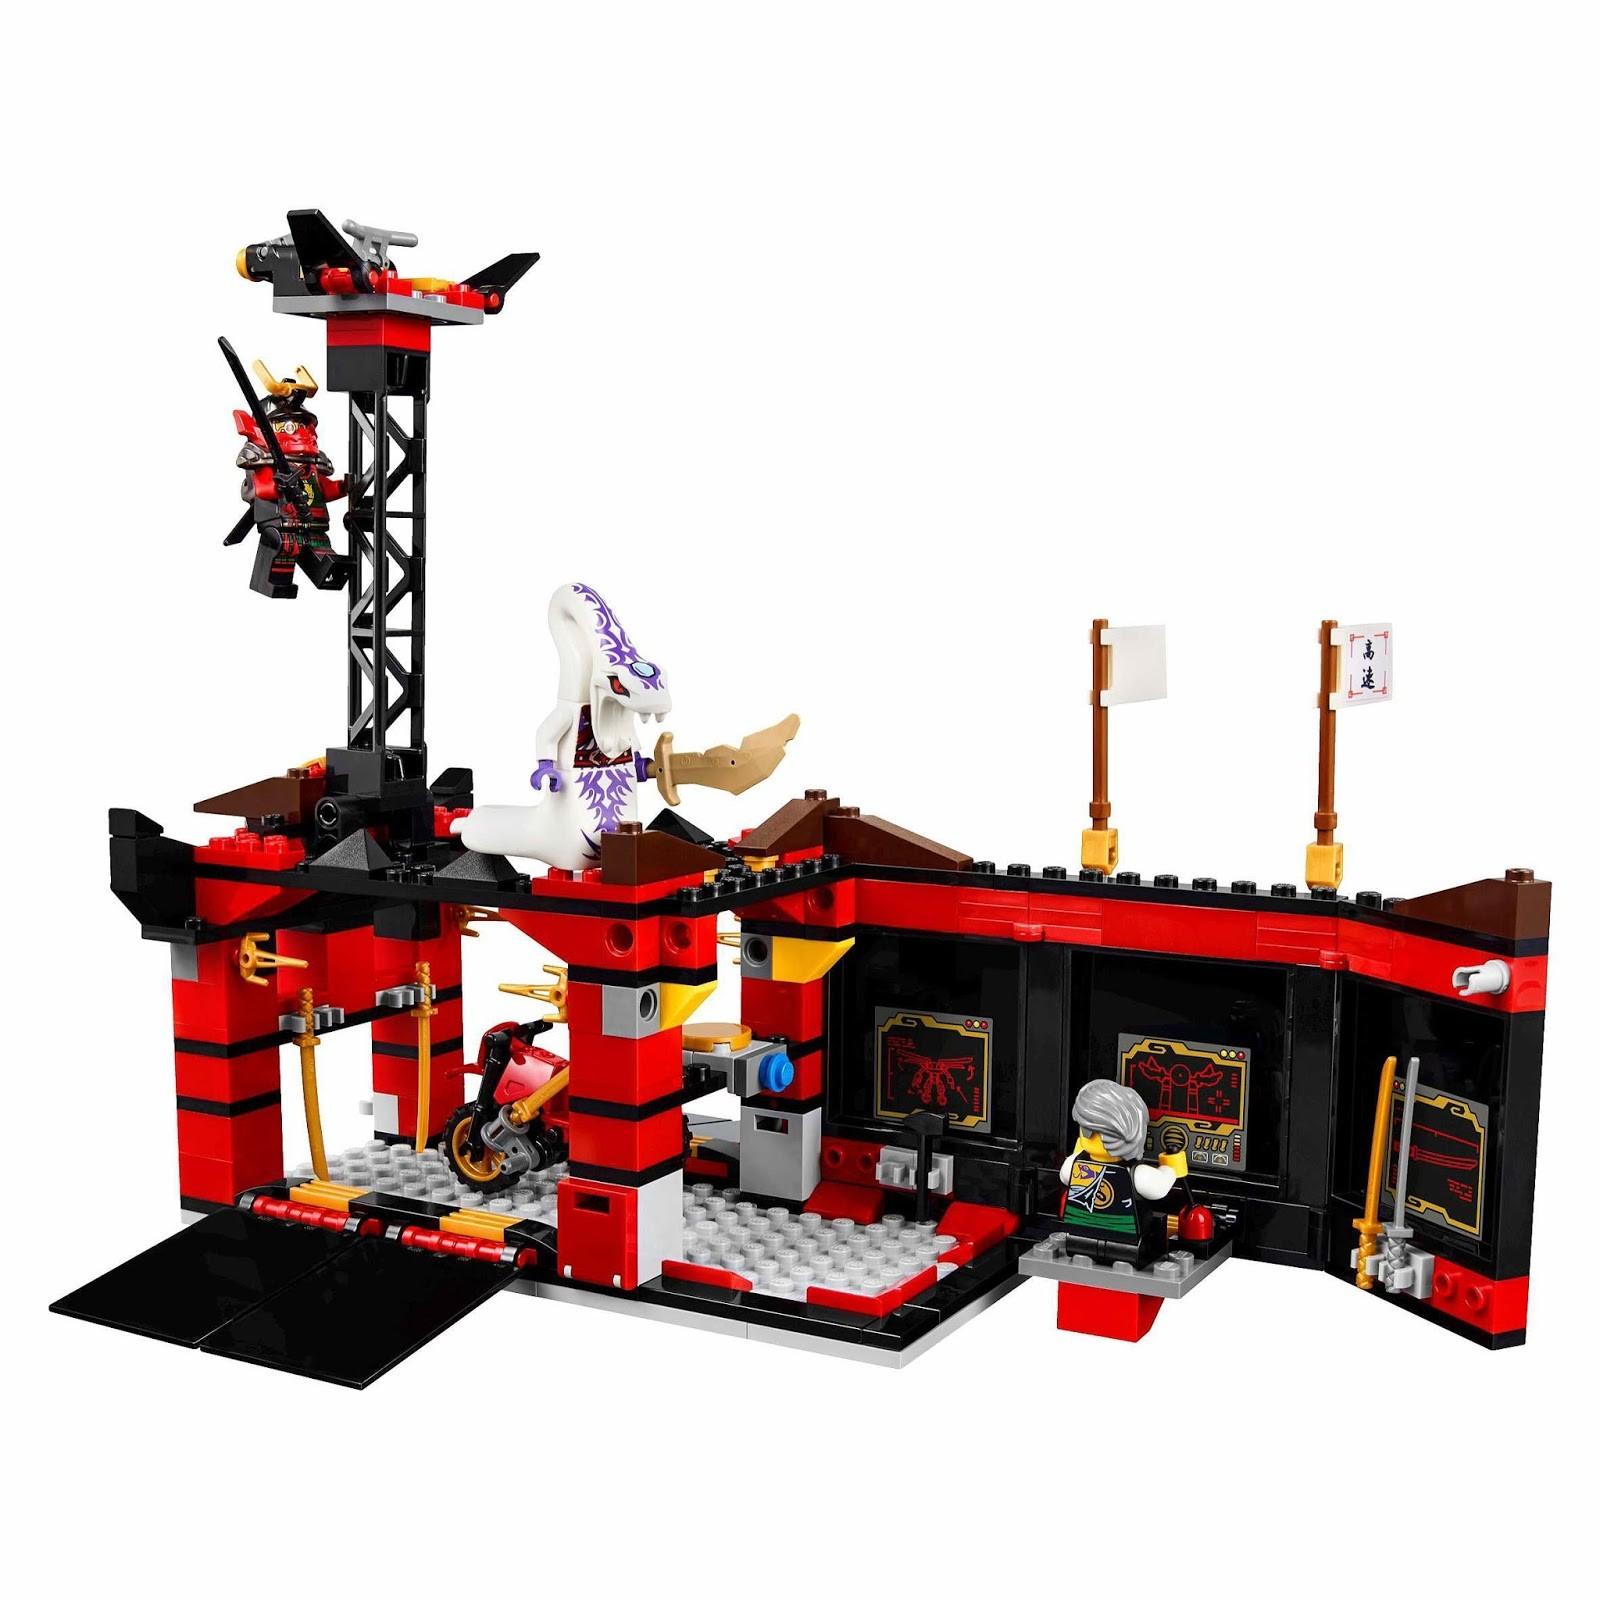 Конструктор Bl «Мобильная база Ниндзя» 10325 (НиндзяГо 70750) / 755 деталей